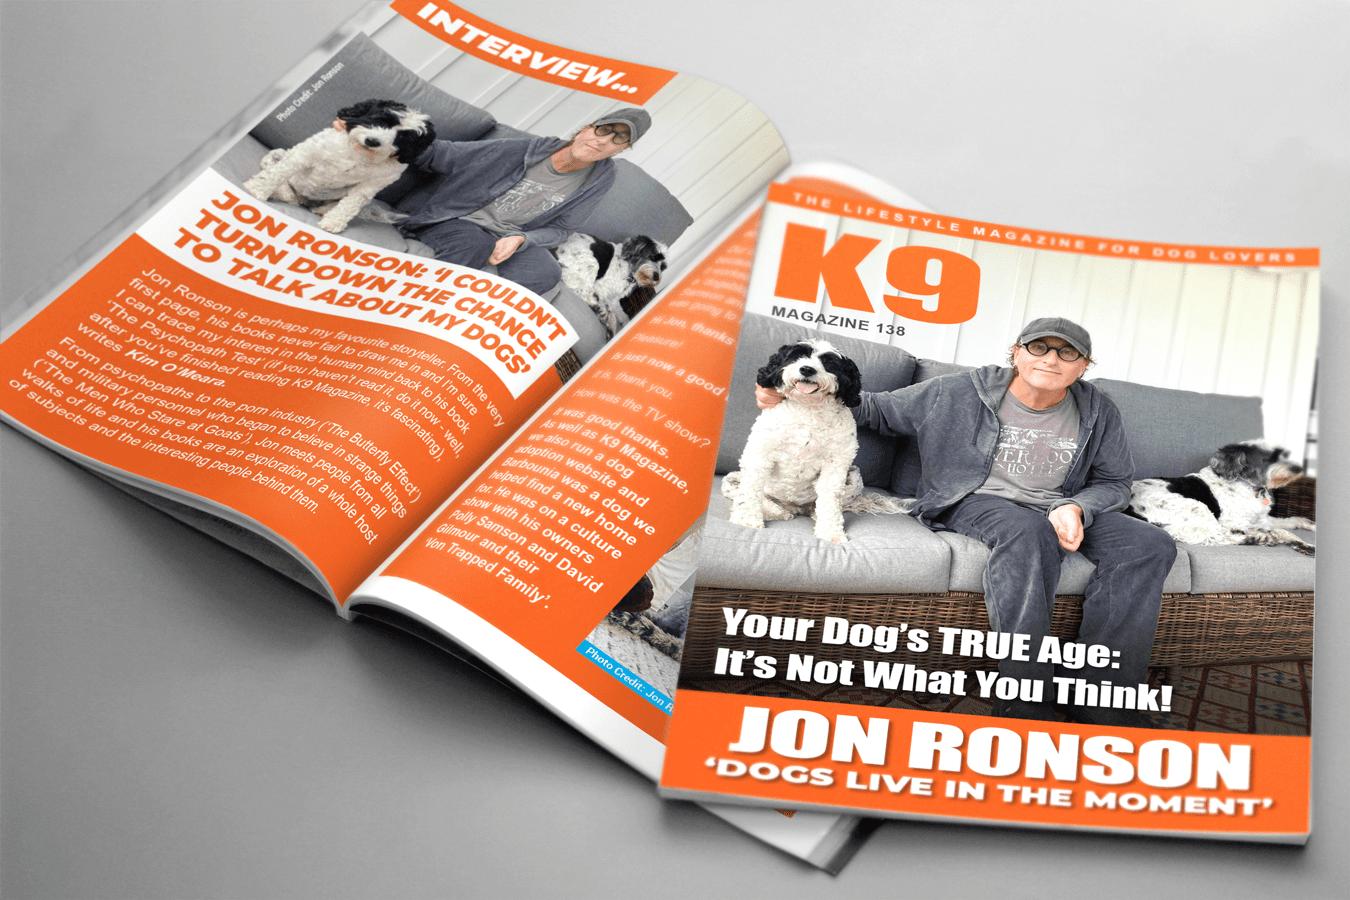 K9 Magazine Issue 138